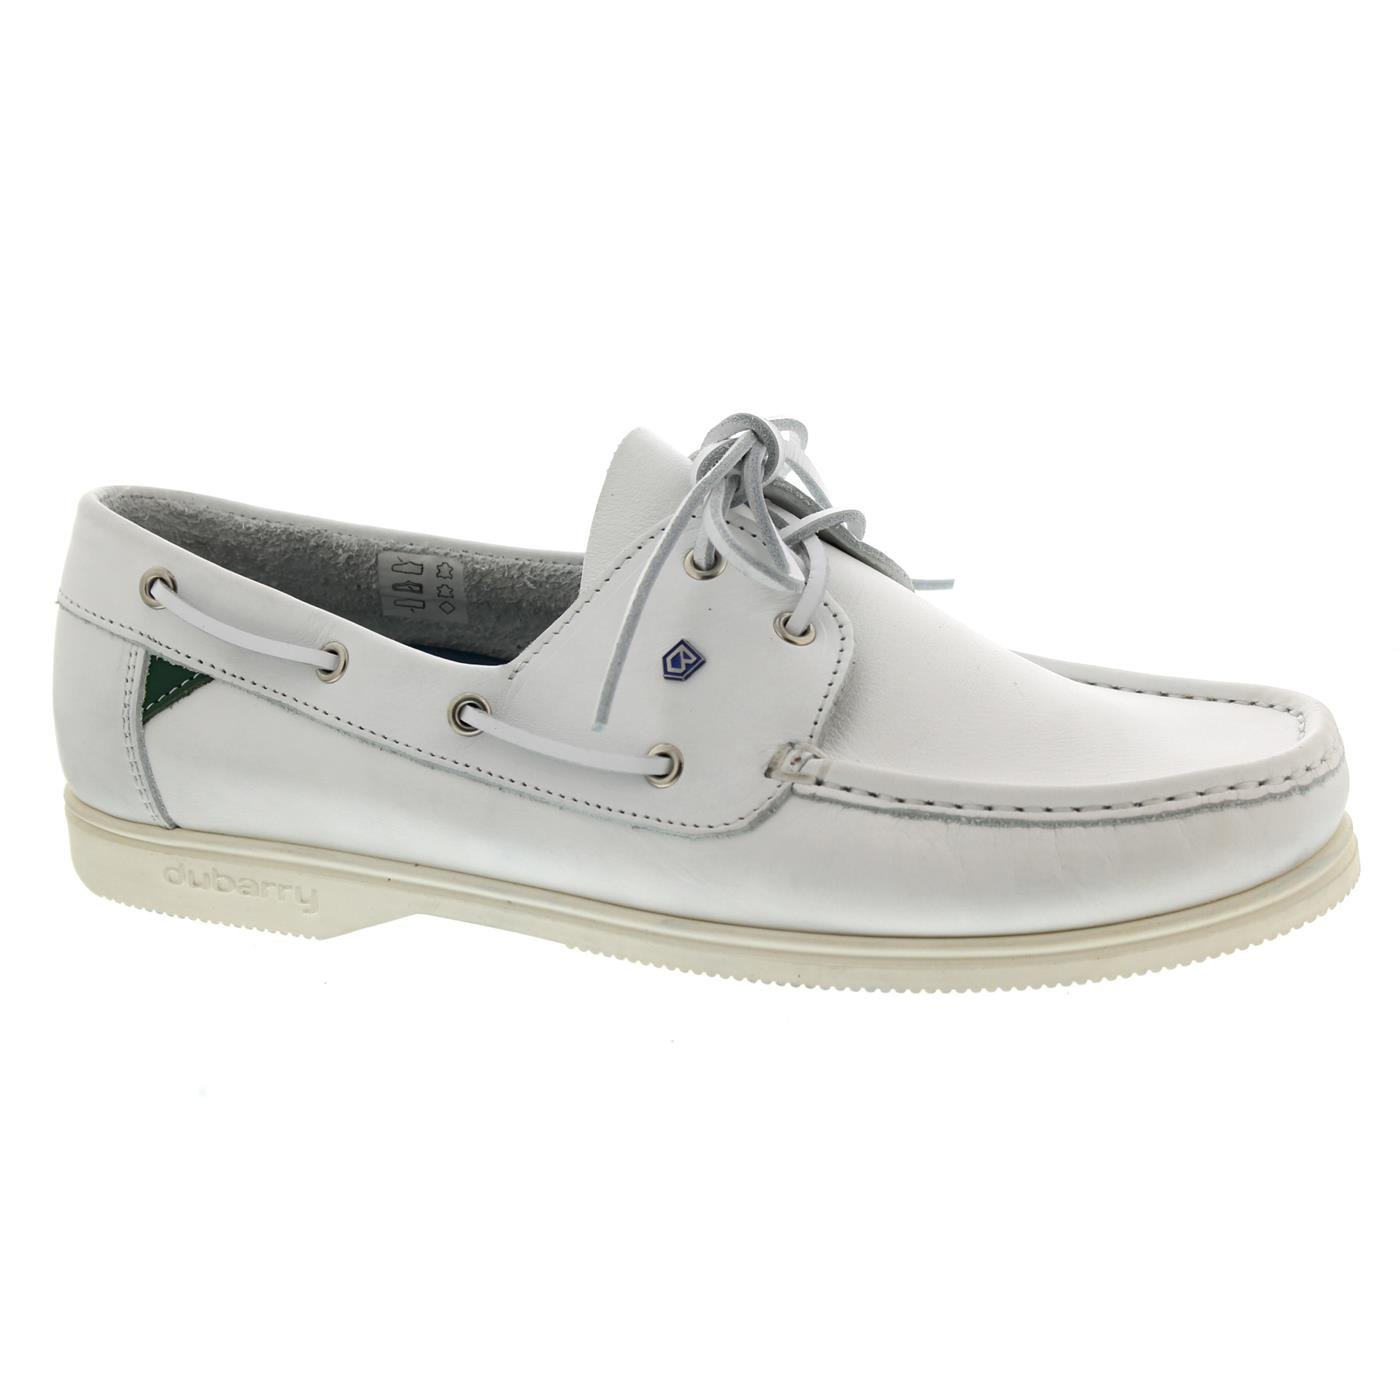 Dubarry Admirals, White, Dry Fast - Dry Soft Leder, (Glattleder) 3331-00  41.5 EU|Wei?